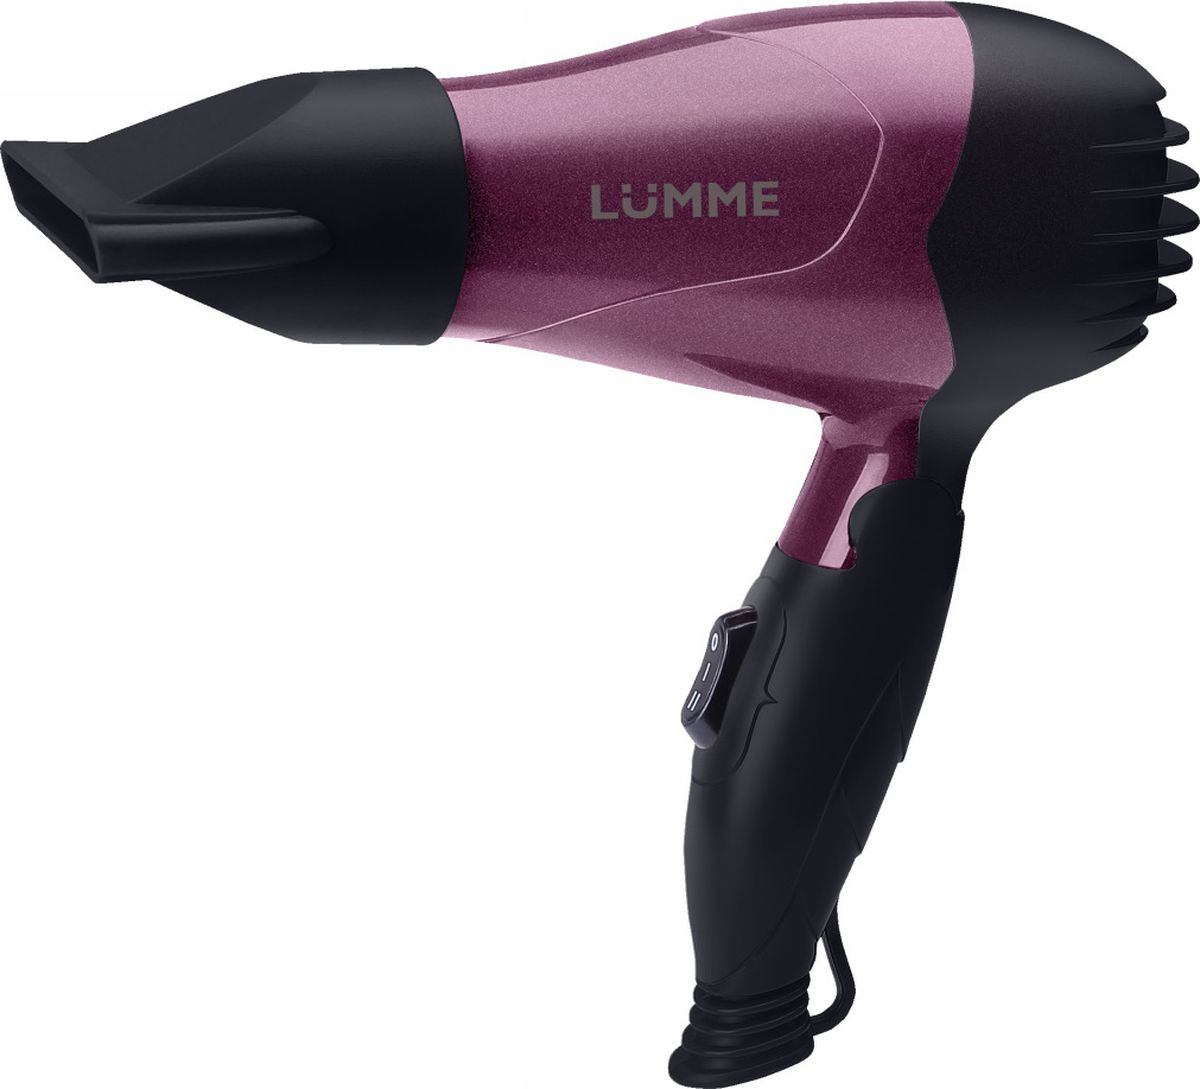 Lumme LU-1045, Purple Charoite фенLU-1045 чароит1200W 2 режима работы, концентратор, складная ручка, покрытие SOFT TOUCH, автоотключение при перегреве, петелька для подвешивания